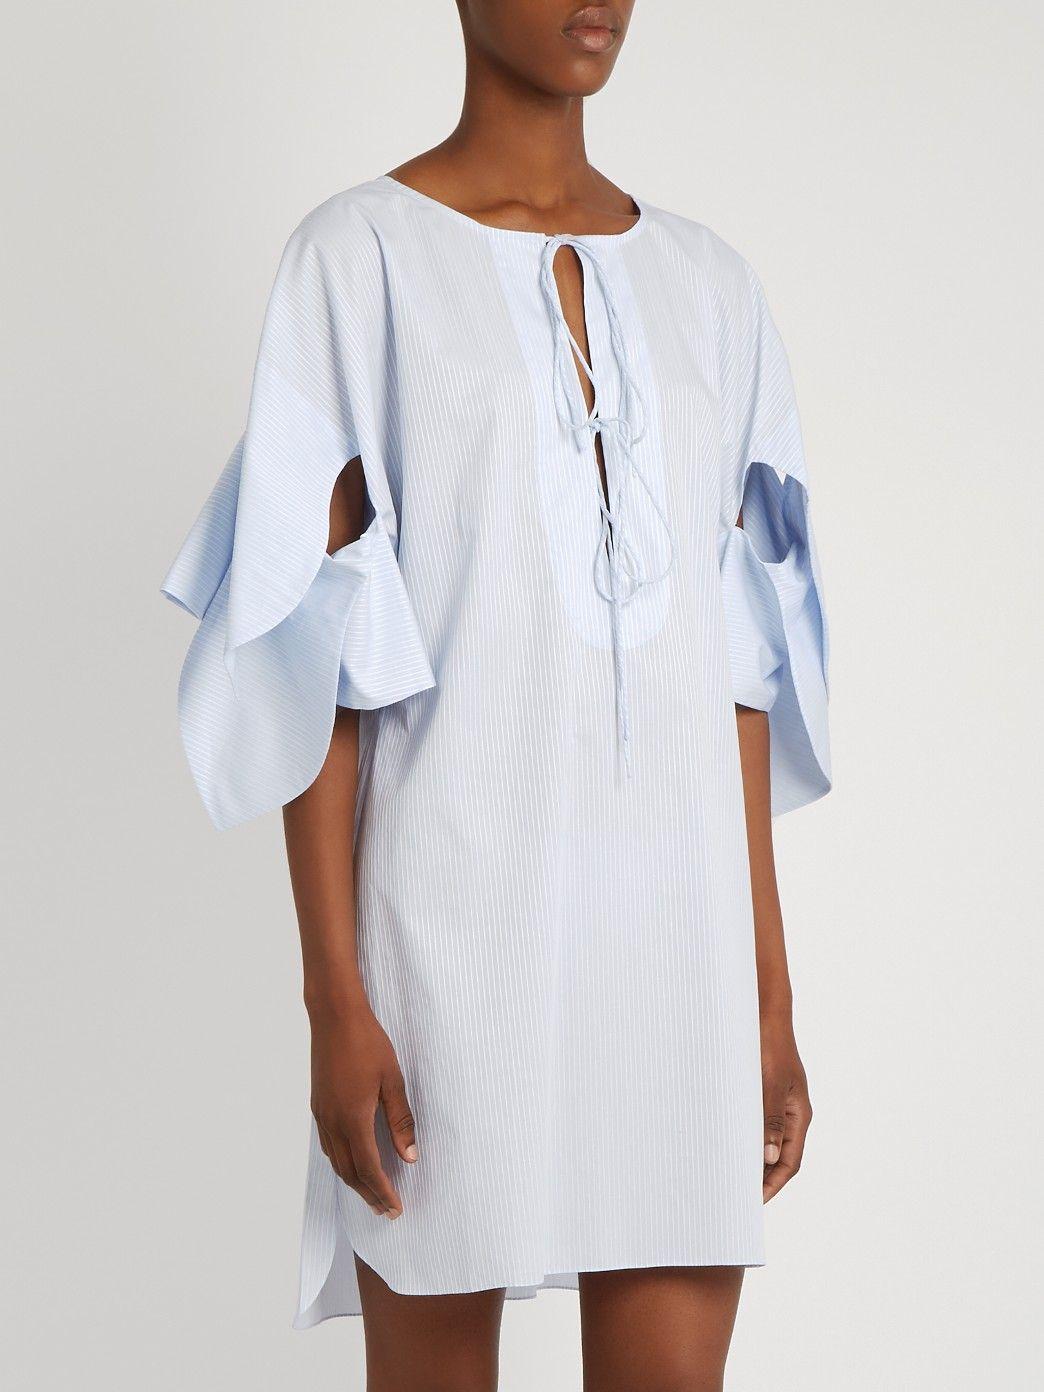 Cephale cotton dress Three Graces London AihVOj4pF